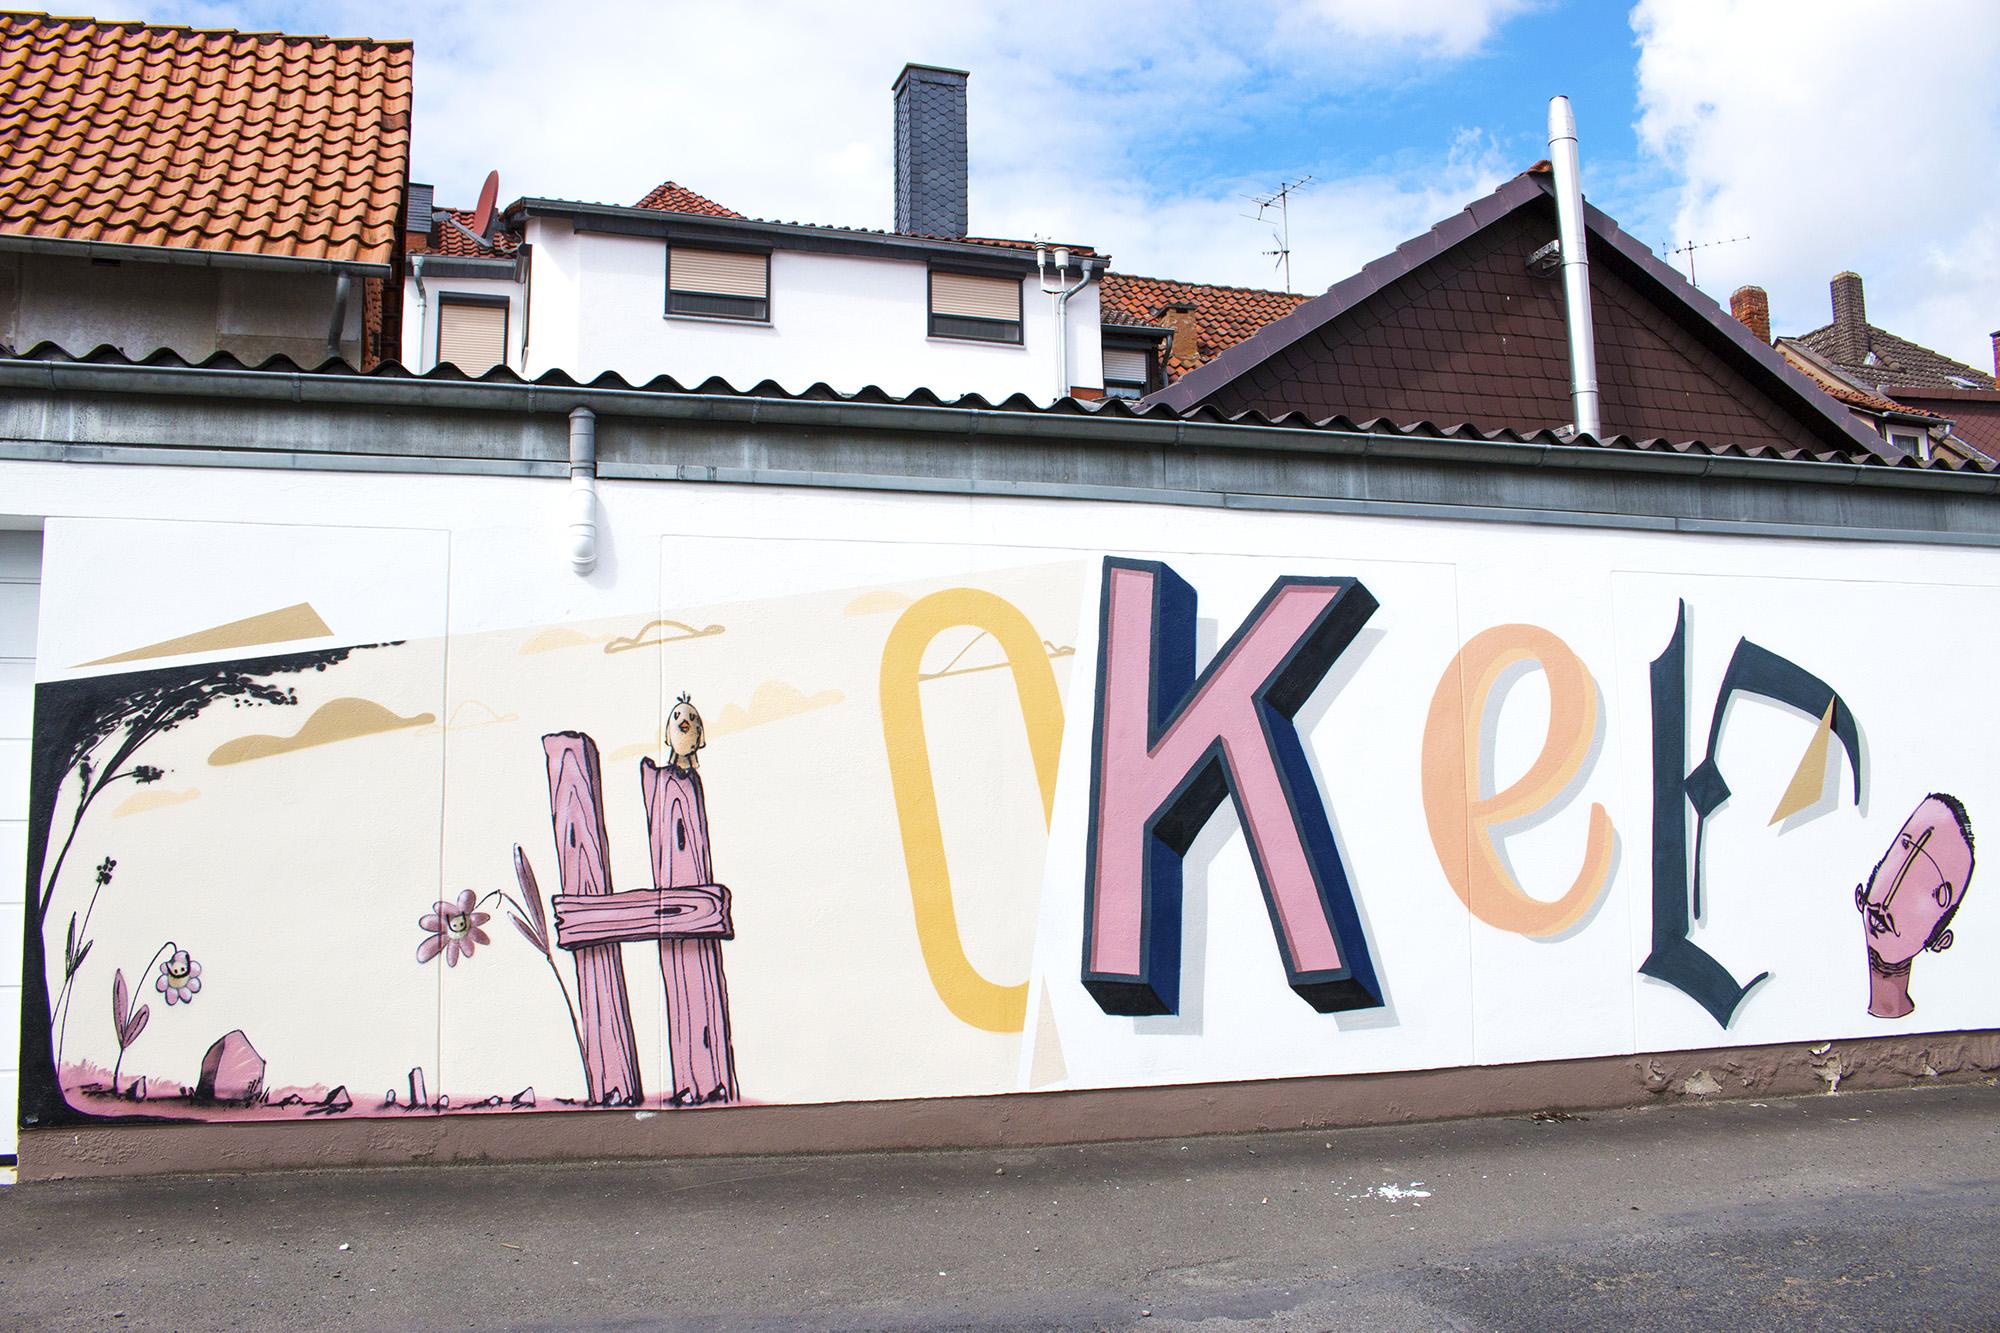 Hoker_2016_Einbeck